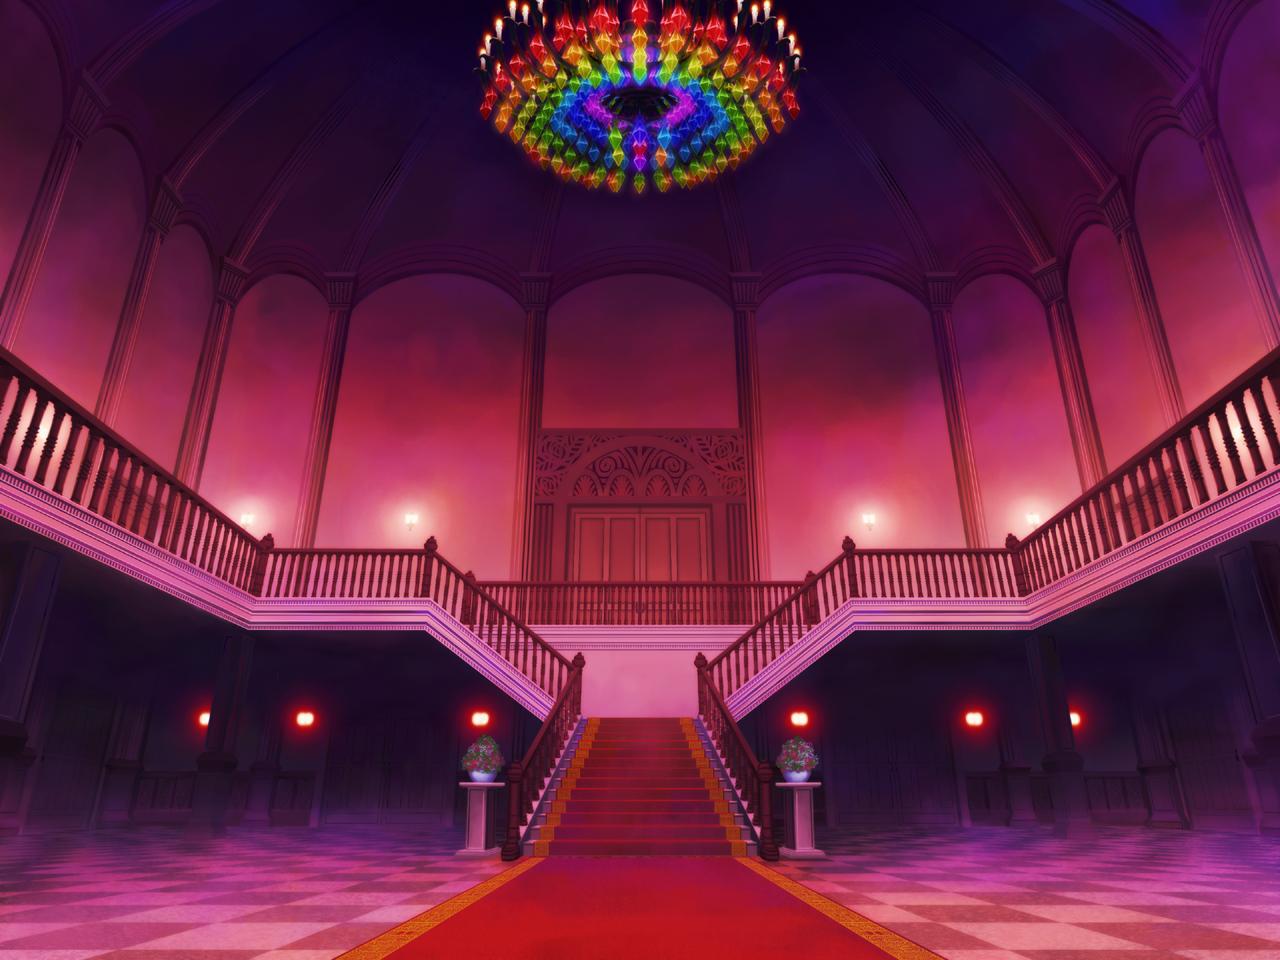 My Foyer Scarlet Devil Mansion Black Amp White Wiki Fandom Powered